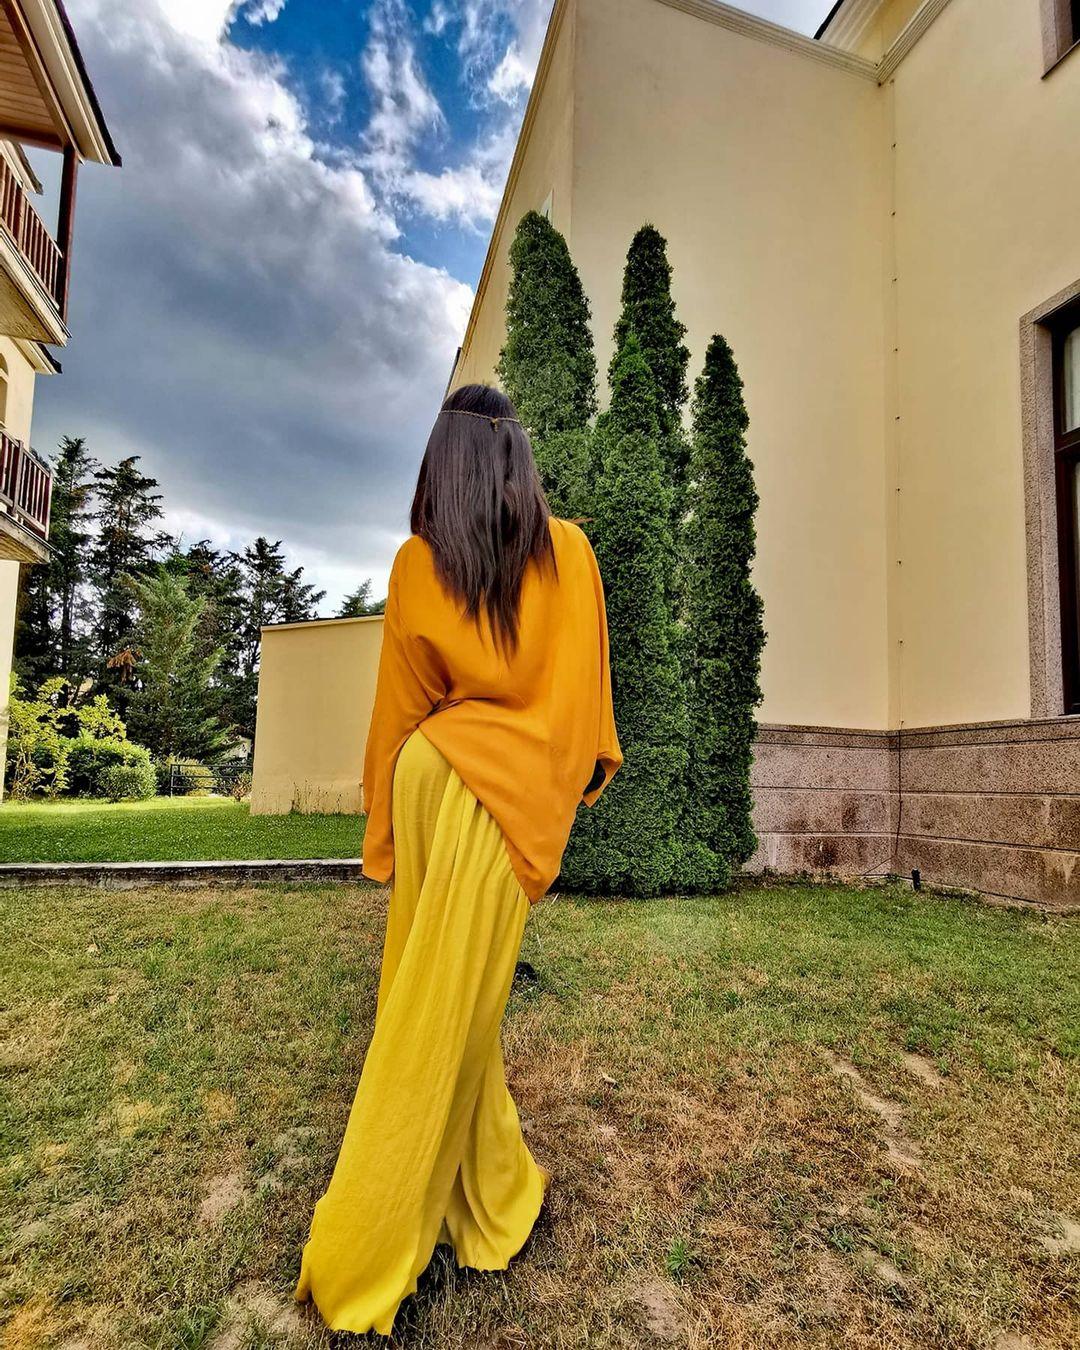 Sophia-Koskina-Wallpapers-Insta-Fit-Bio-12